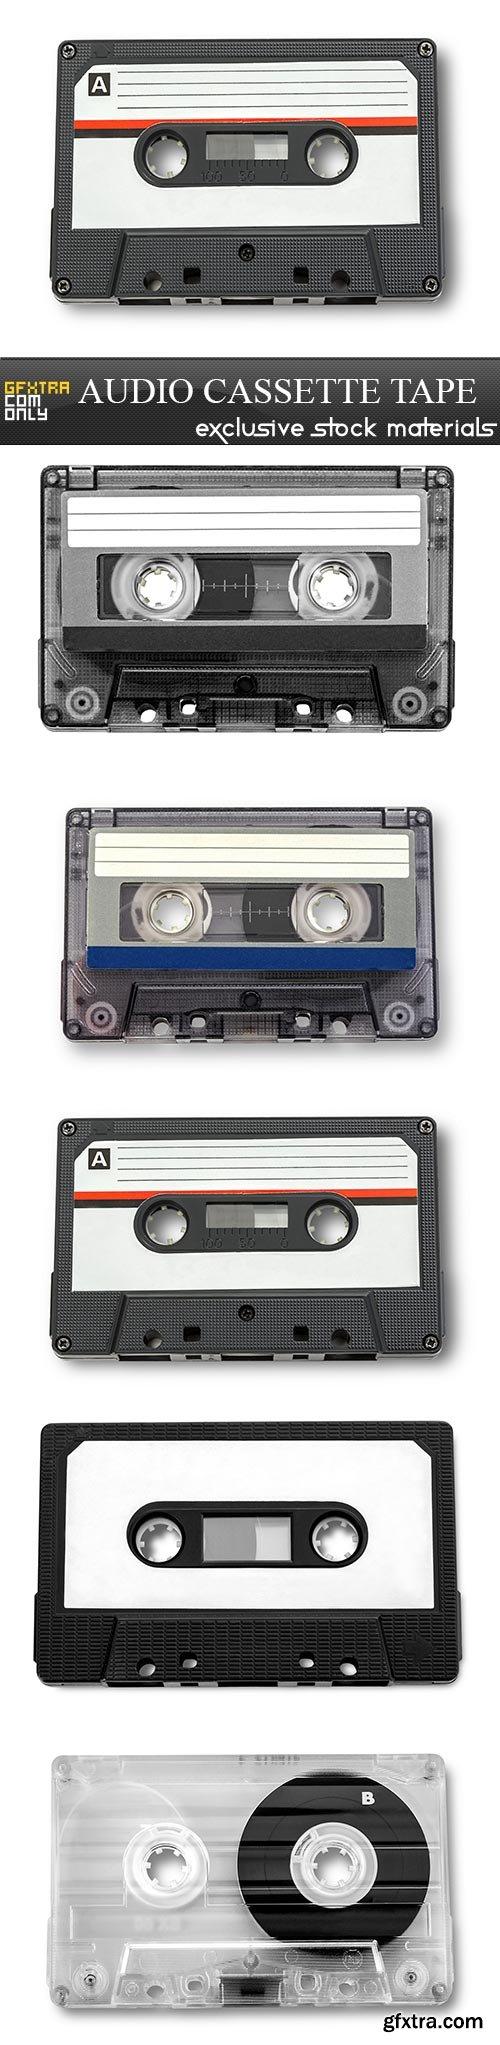 Audio cassette tape, 5 x UHQ JPEG